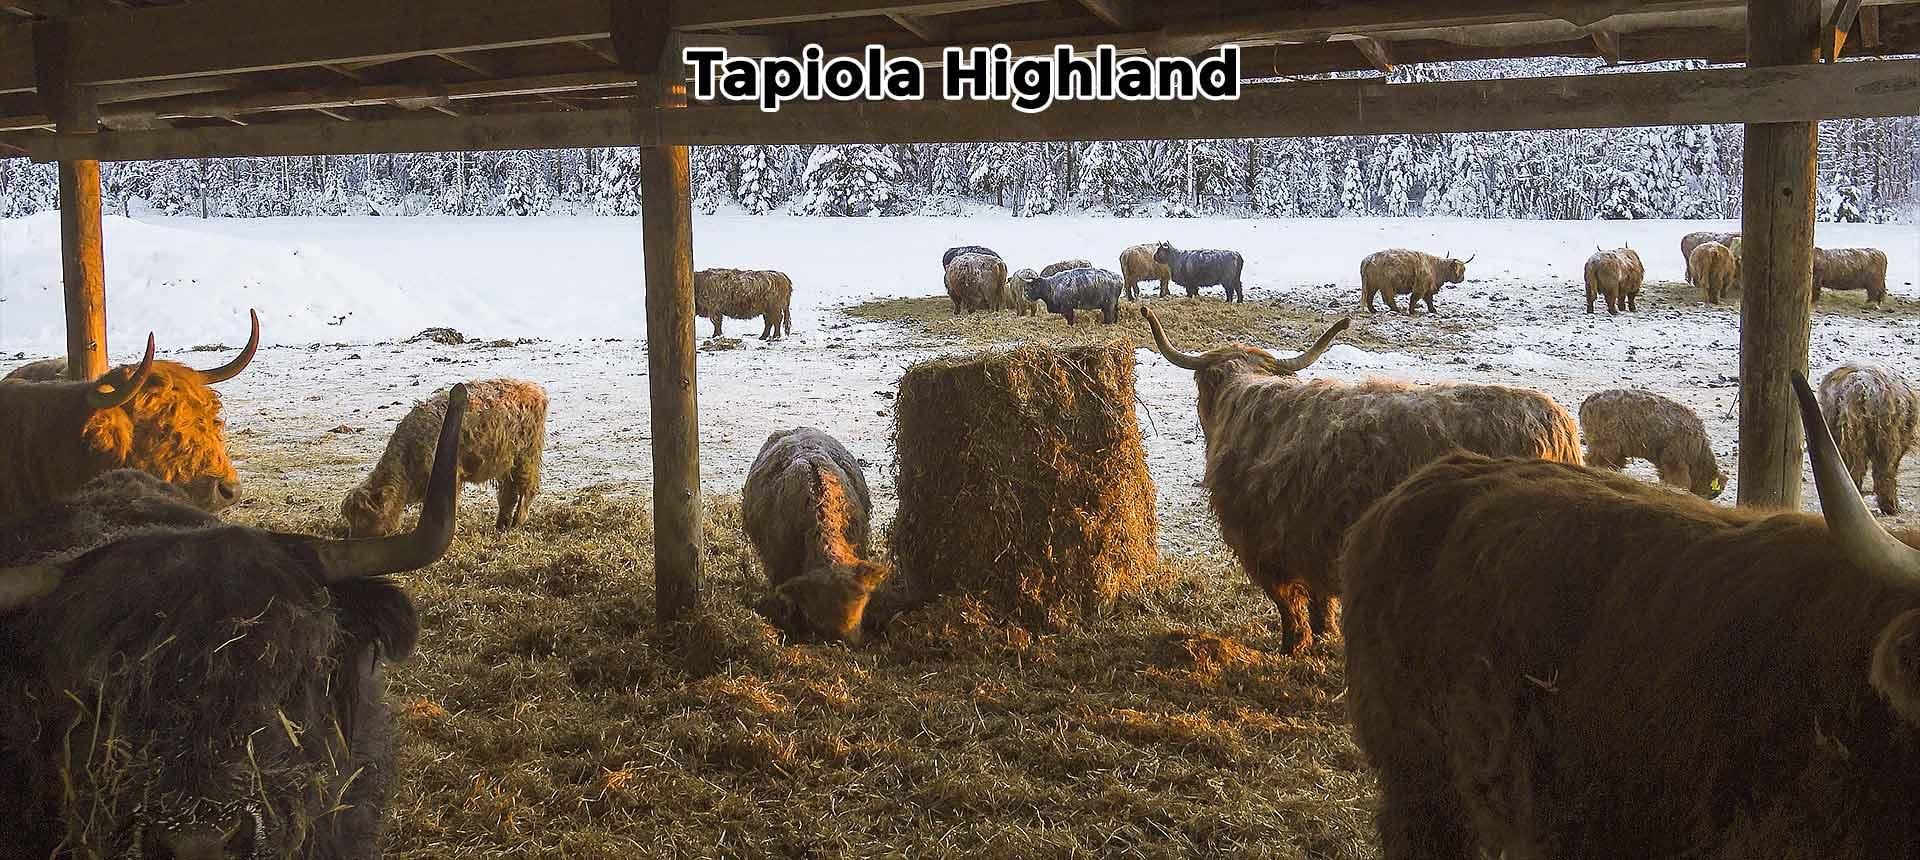 Tapiola Highland